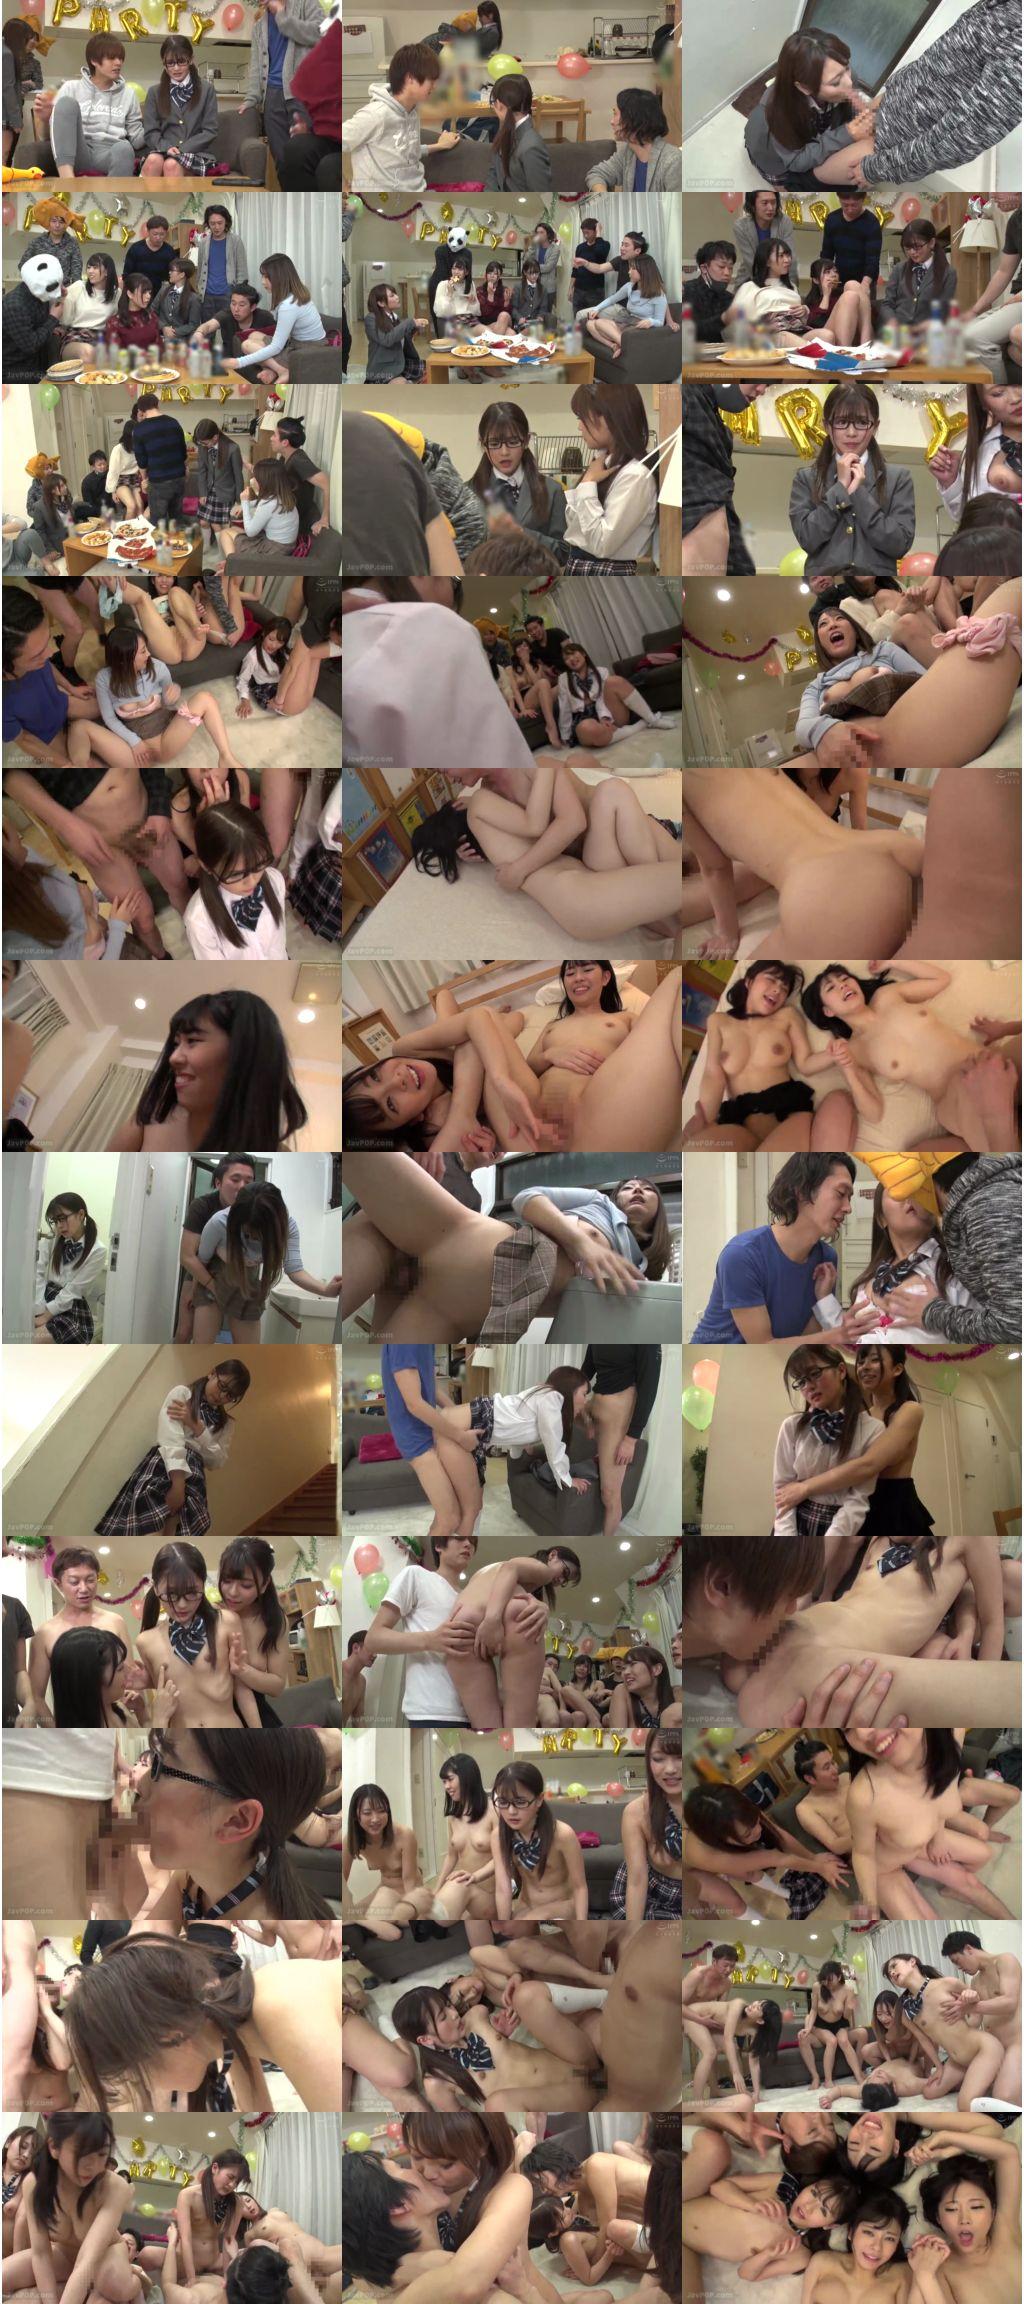 hunta 799 s - [HUNTA-799] 「友達の前でこんなエッチな姿するの恥ずかしい…、でも…」ヤリマン女子が連れてきたウブ制服女子が初めての乱交で乱れまくり! Kawajiri 女子校生 Takasaka Airi Misaki Azusa HHHグループ